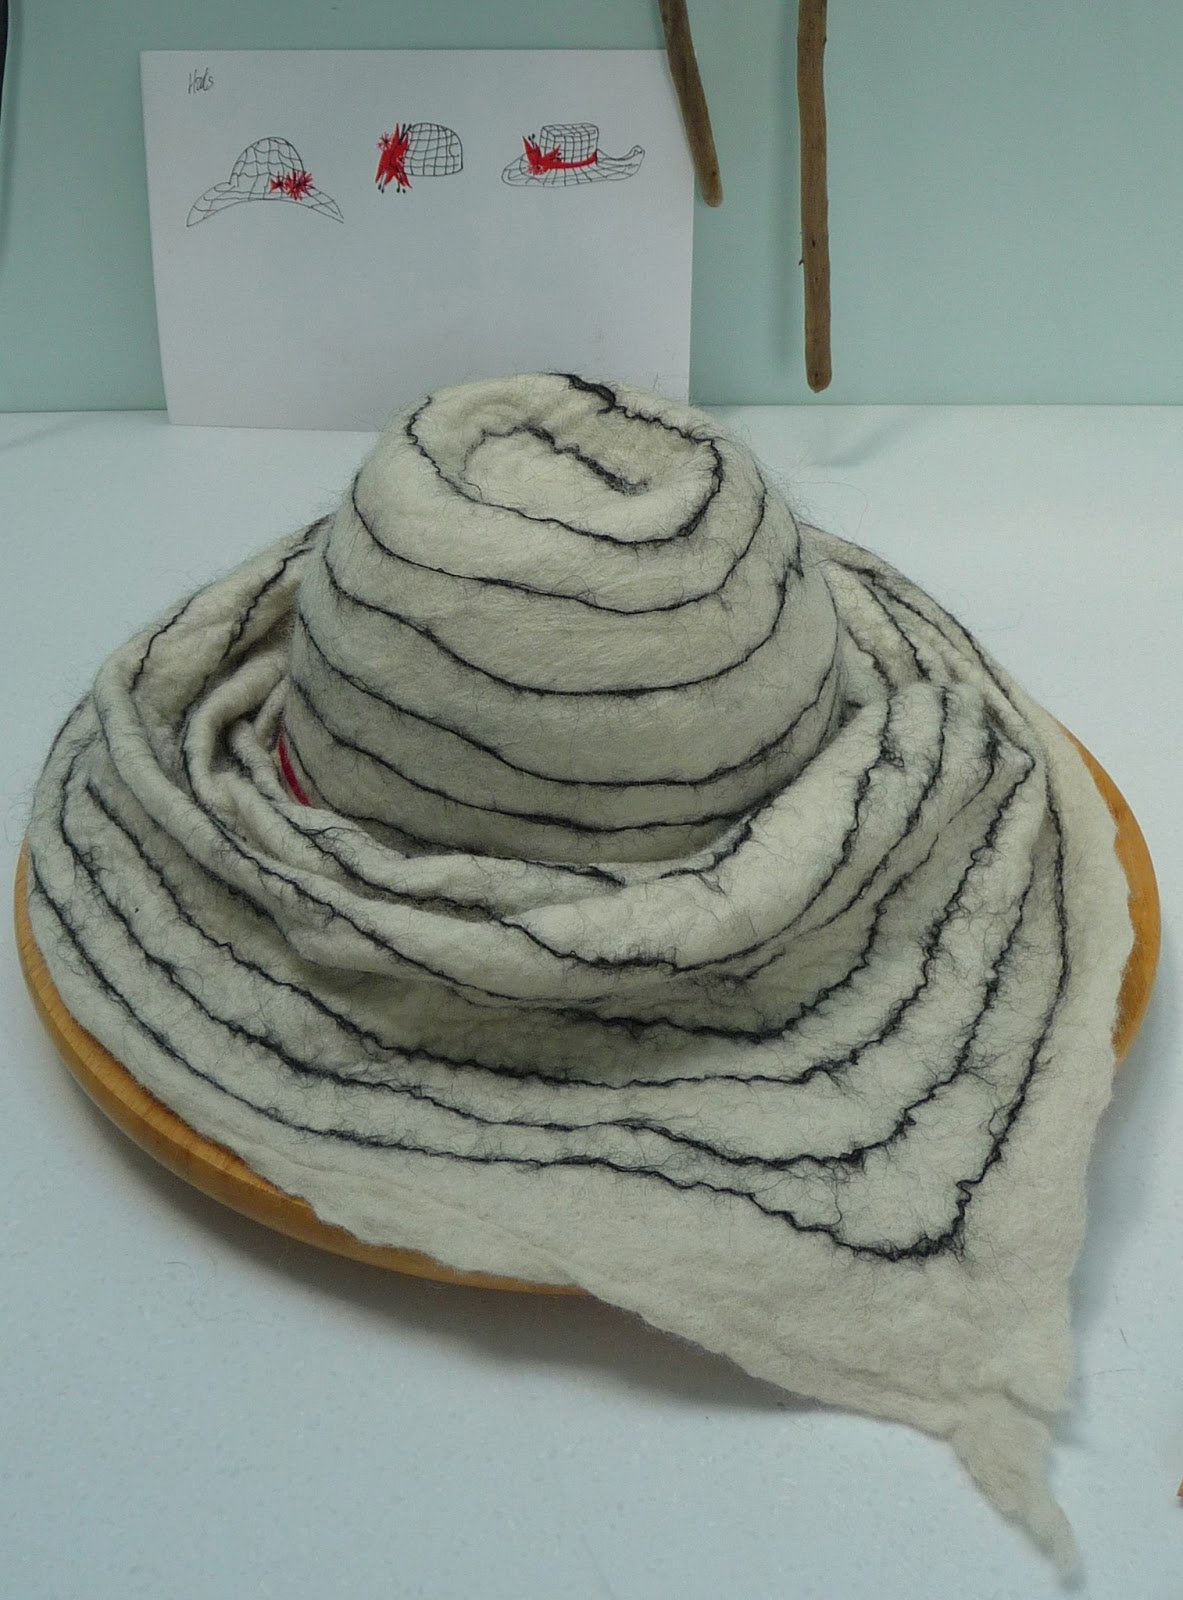 how to make felt from sheep fleece